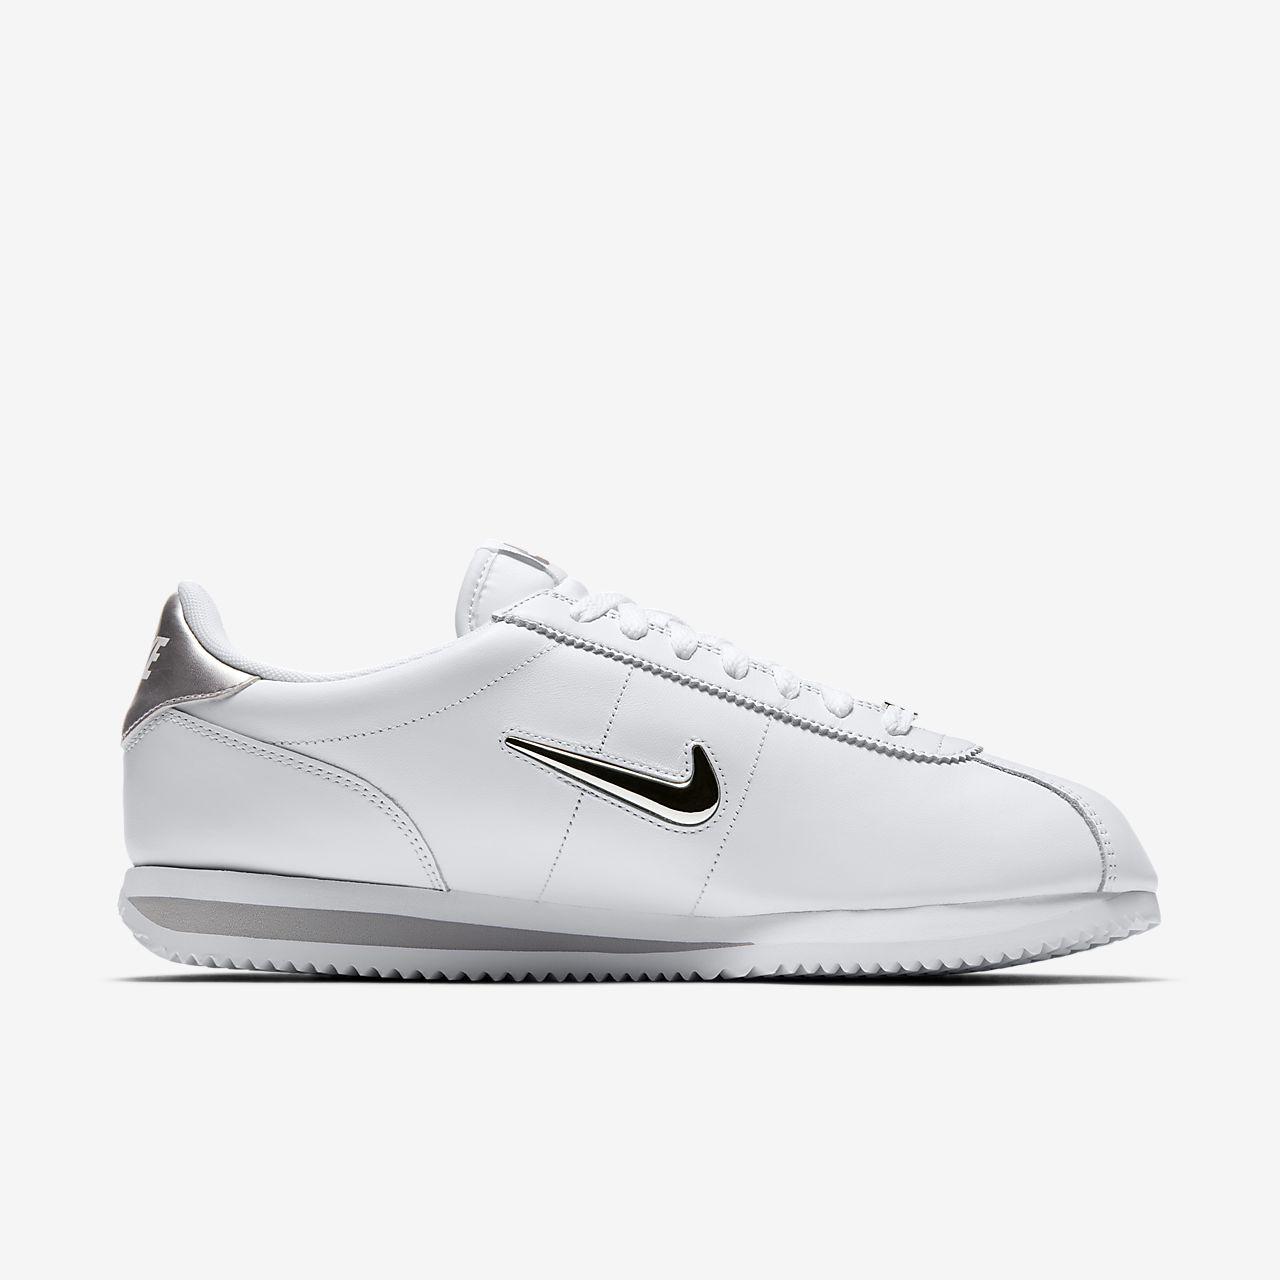 Nike Cortez Basic Jewel, Baskets Homme, Blanc (White/Metallic Silver), 45 EU